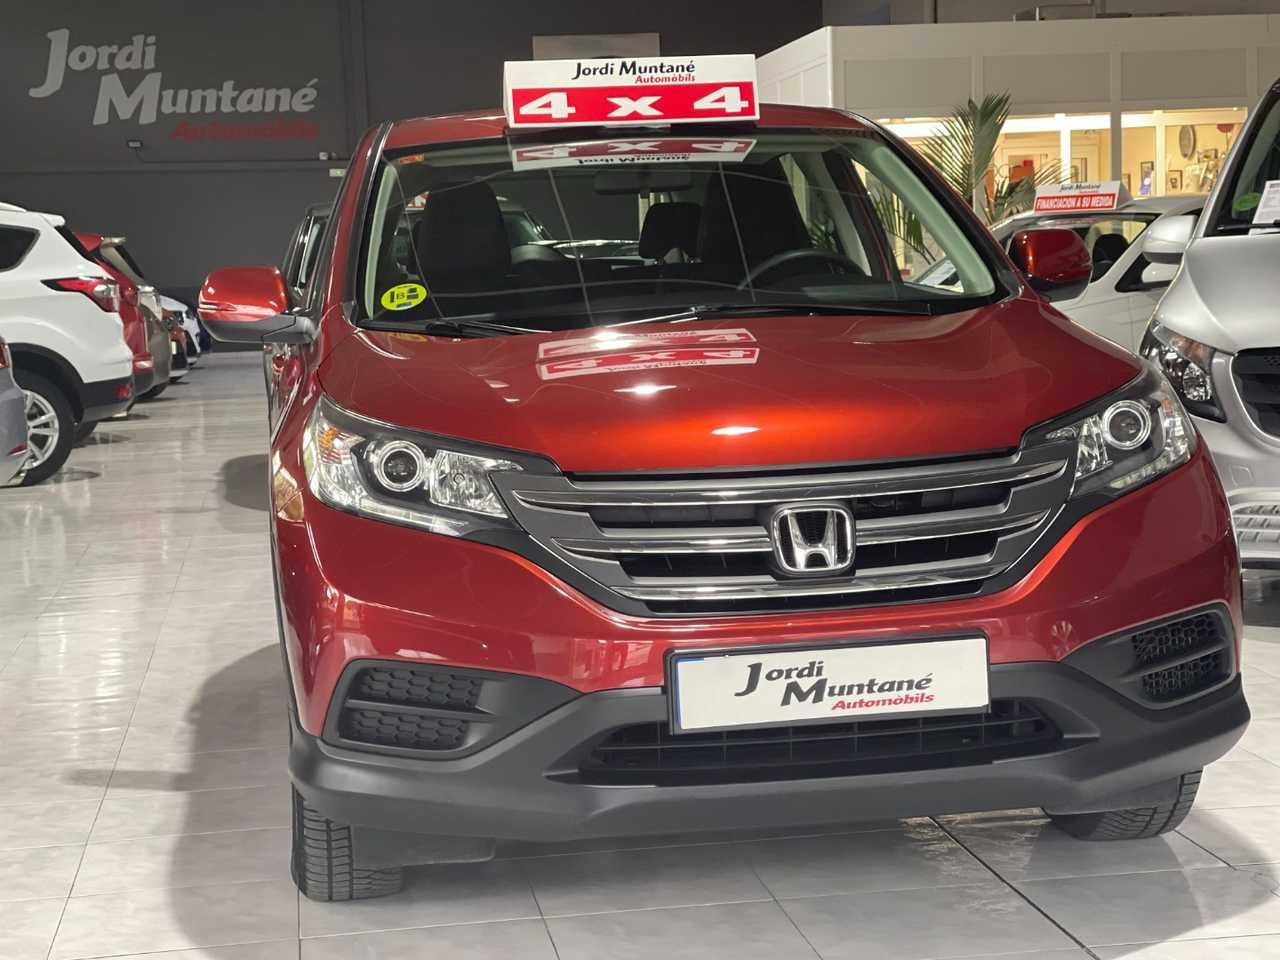 Honda CR-V 2.2 CDTI i-Dtec 150cv 4WD -. '' Comfort 5 Puertas'' .- MUY CUIDADO-.